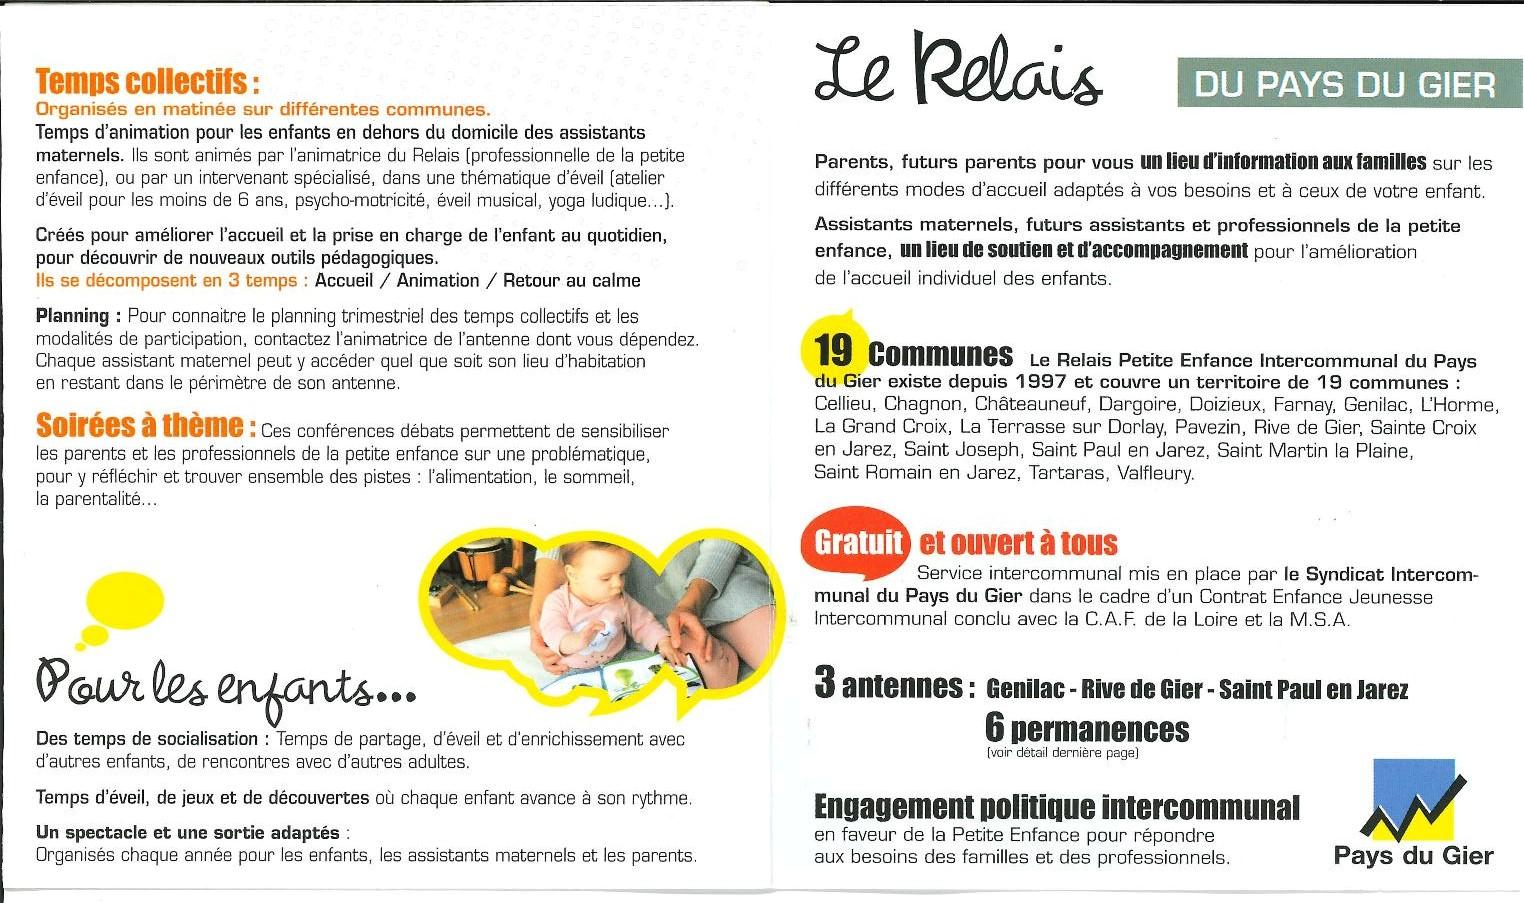 Relais Petite Enfance Pays du Gier _5_.jpg